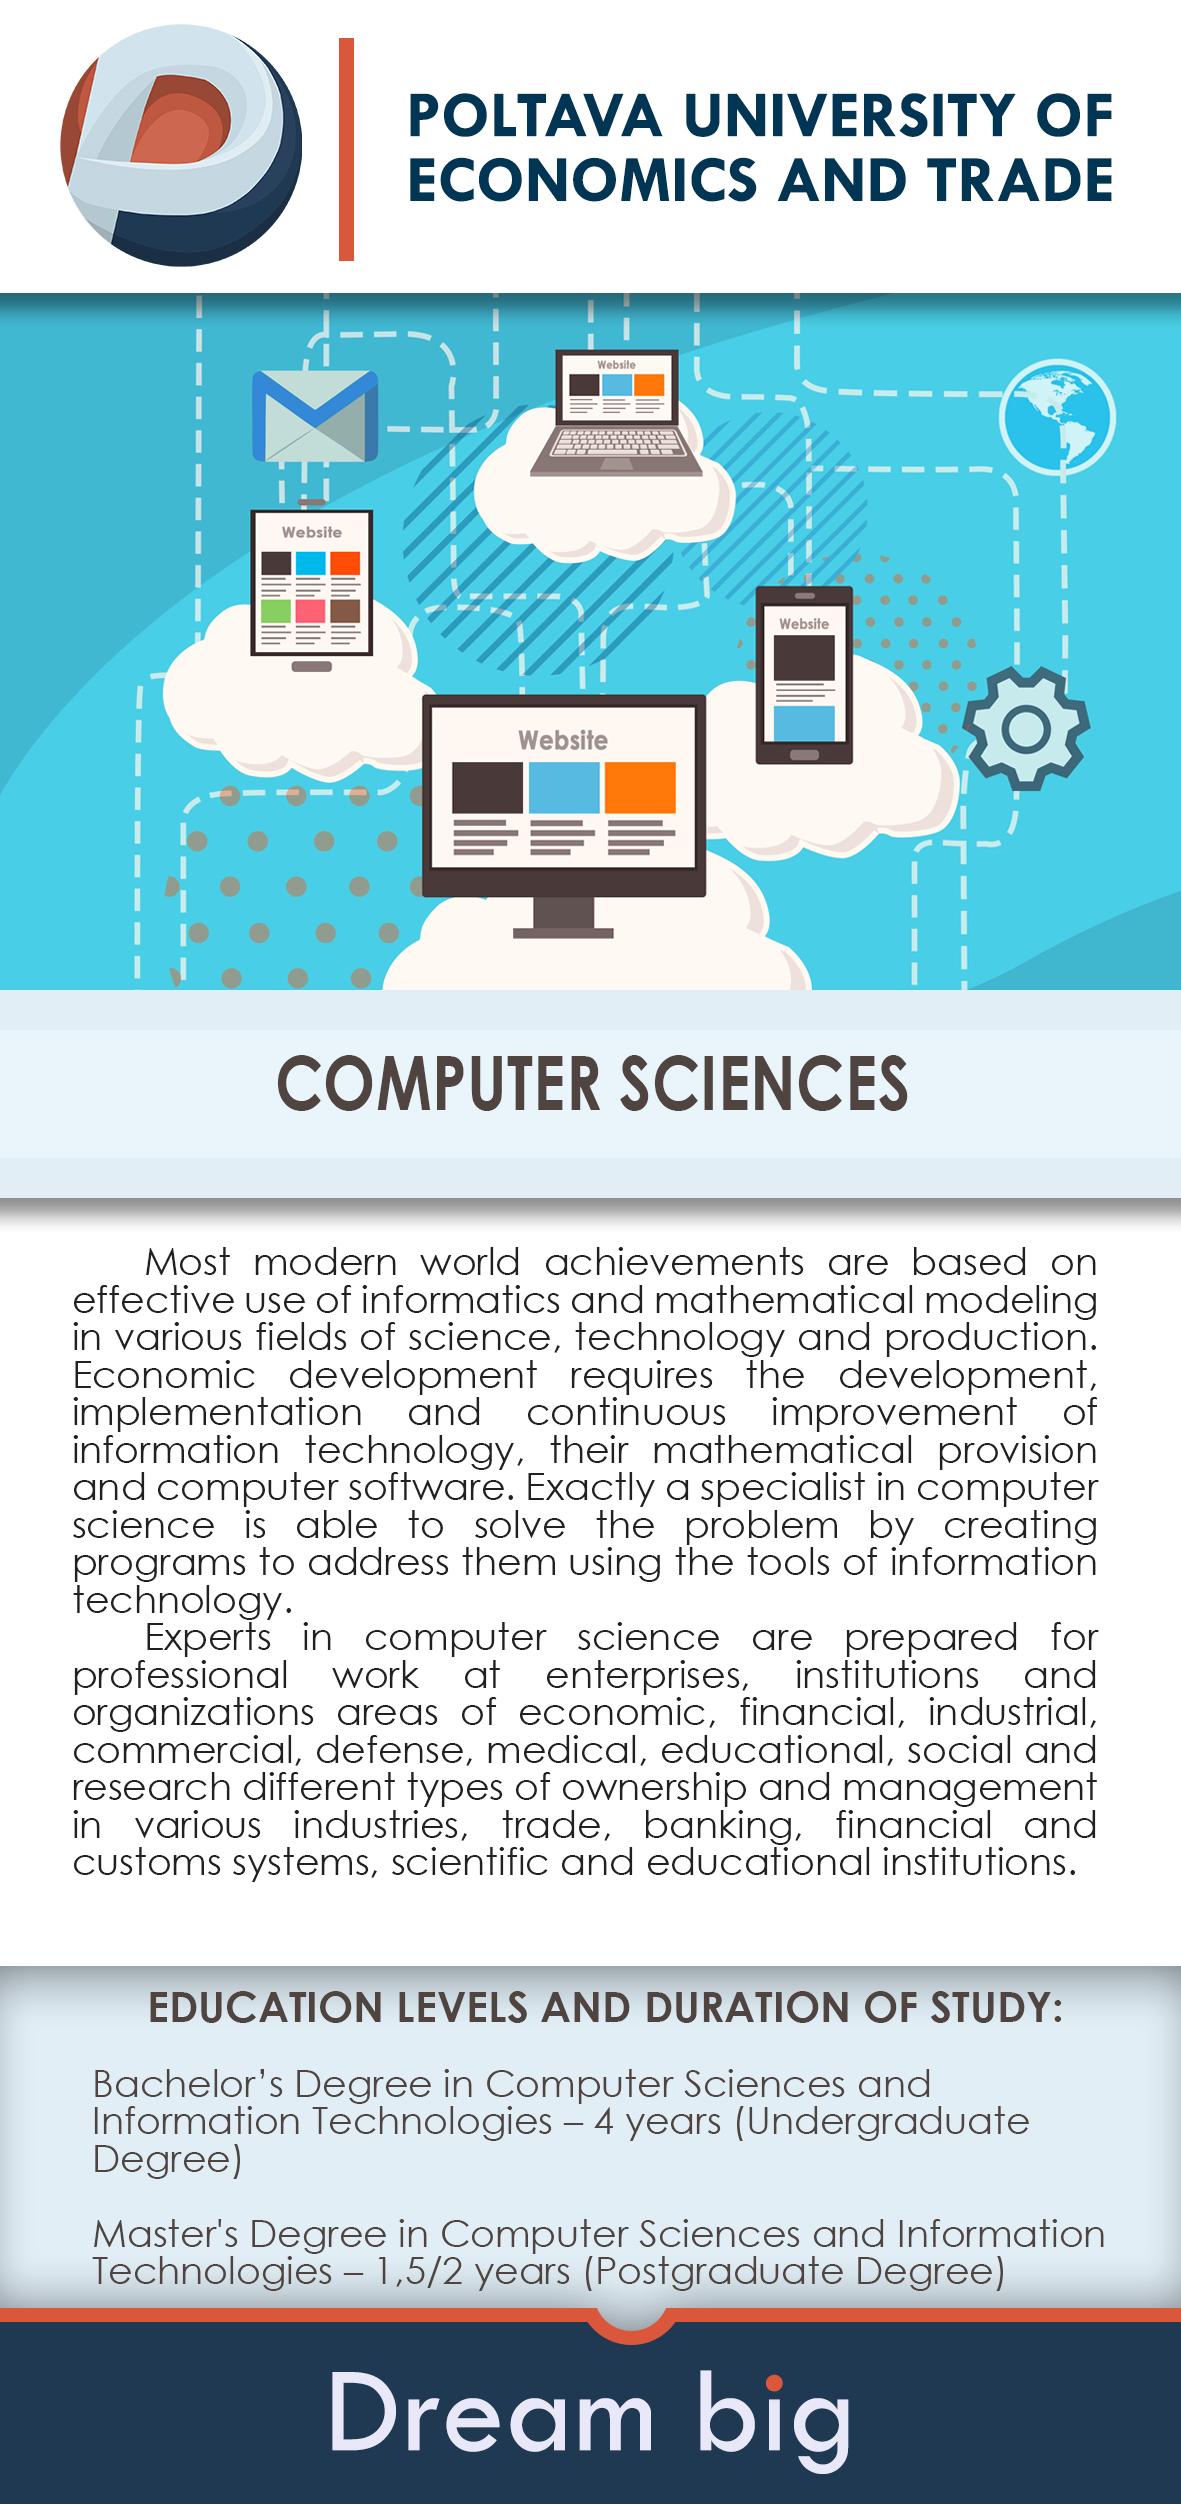 Study Abroad In Ukraine Eastern Europe Poltava University Of Economics Trade Bachelors De Computer Science Engineering Computer Science Fields Of Science